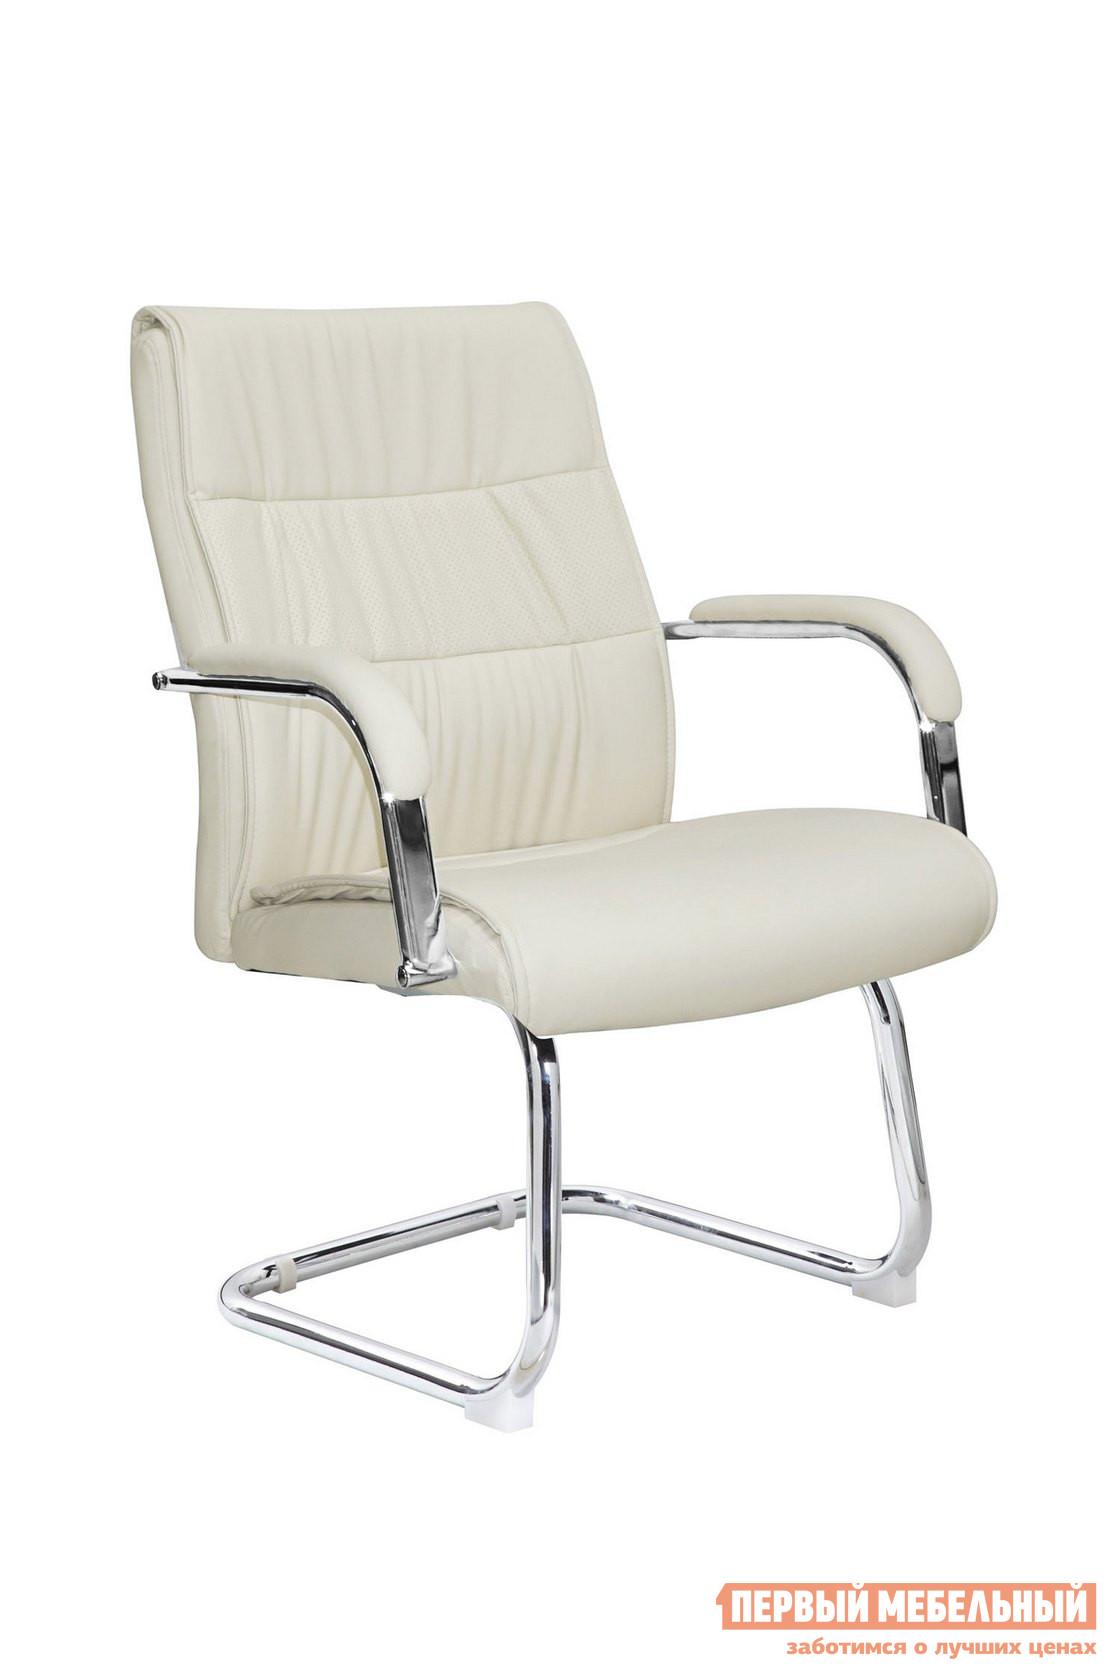 Стул для офиса Riva Chair Кресло RCH 9249 - 4 Бежевый (QC-09) от Купистол